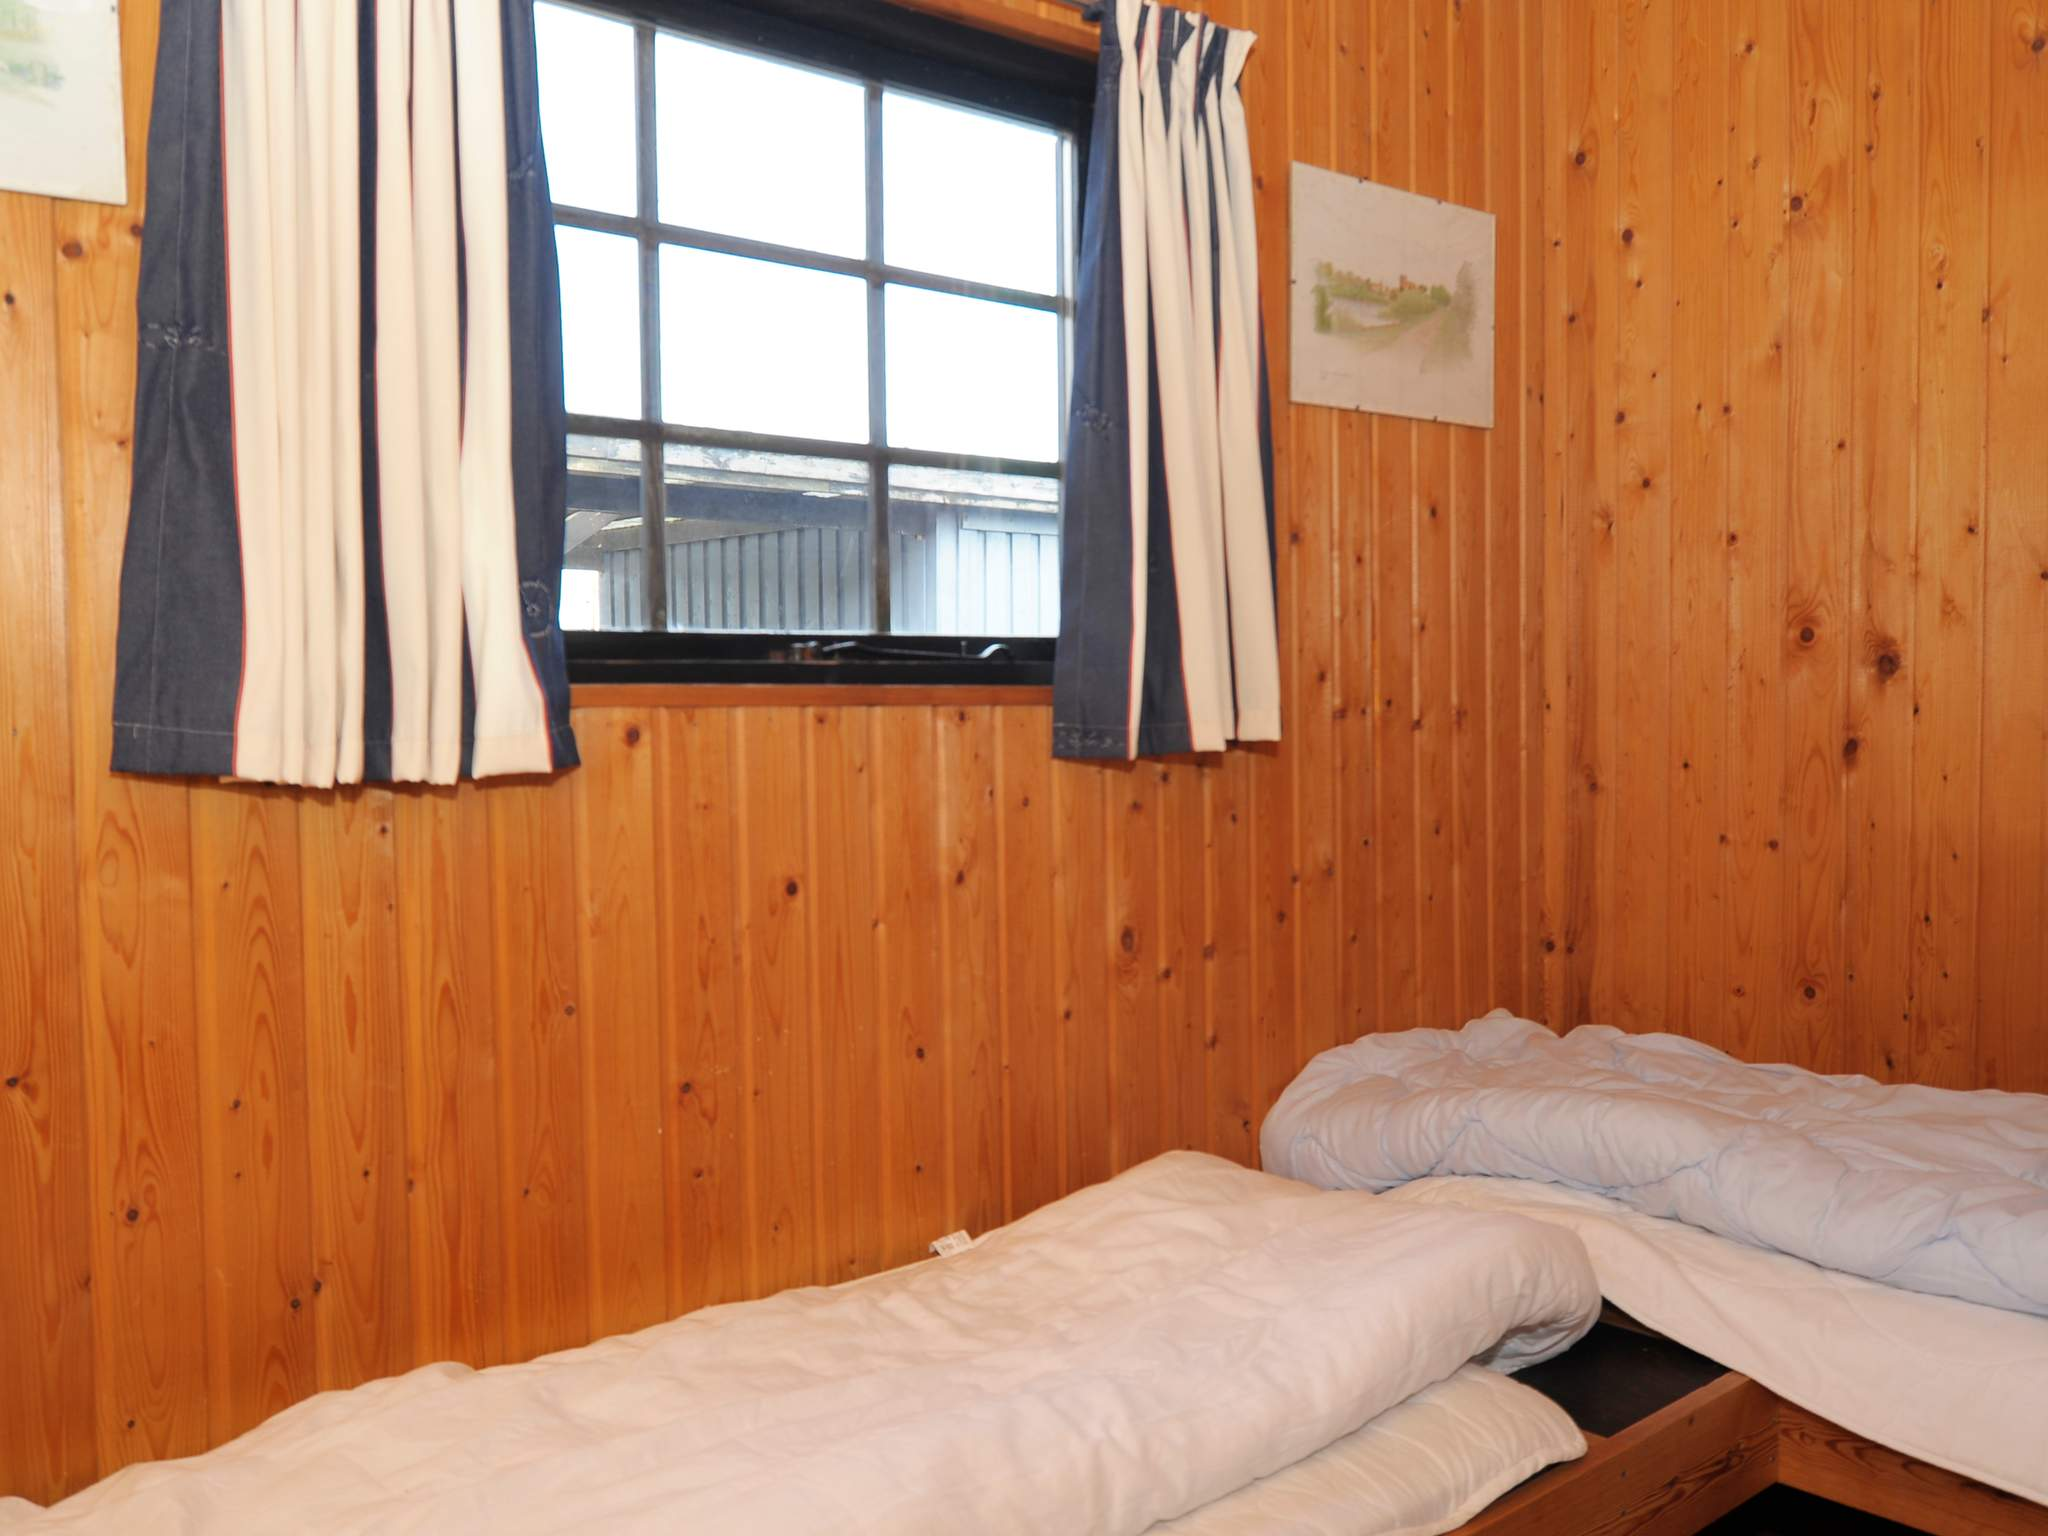 Ferienhaus Blåvand (82266), Blåvand, , Westjütland, Dänemark, Bild 12